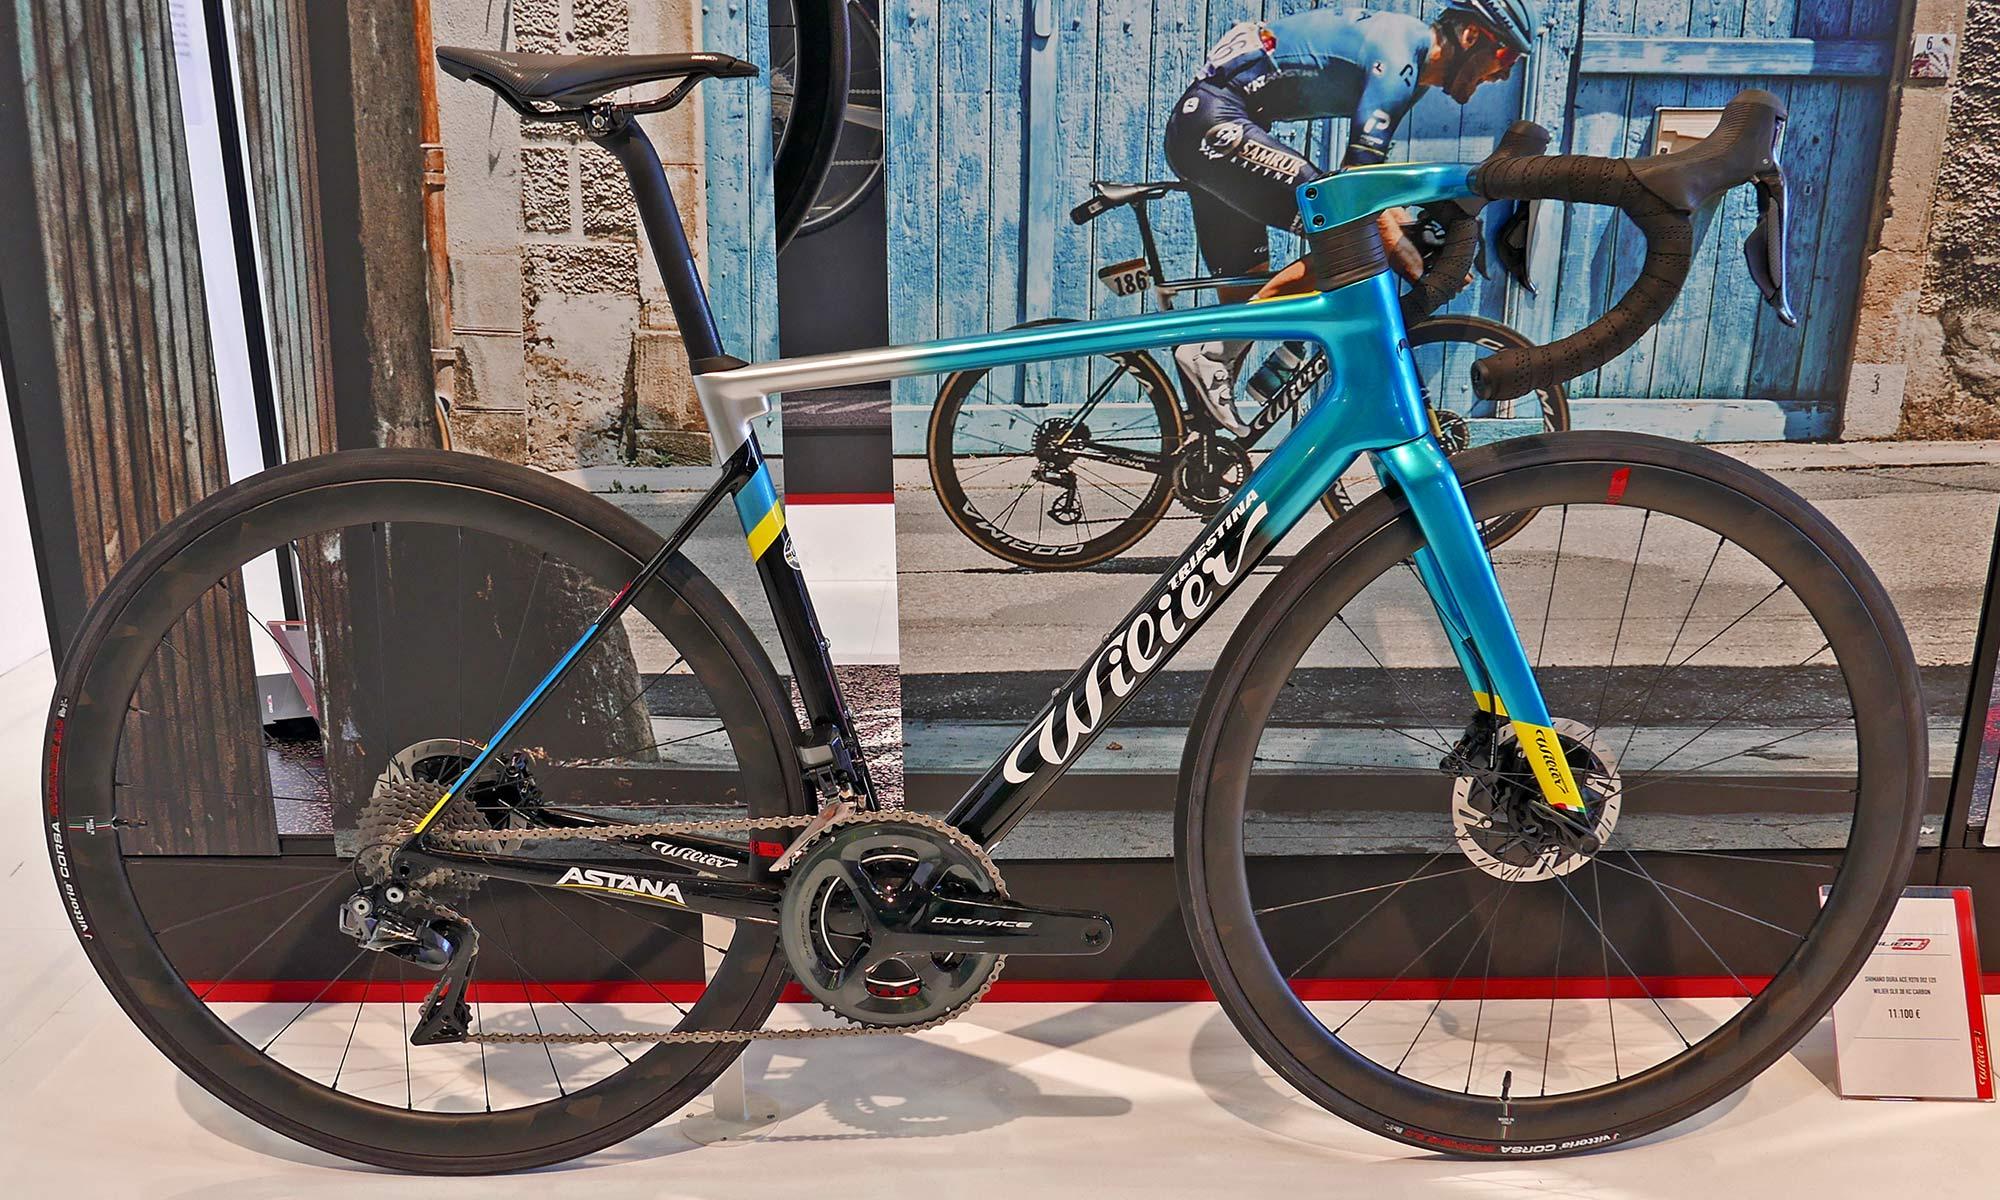 Wilier 0 SLR lightweight carbon all-rounder road race bike, Astana